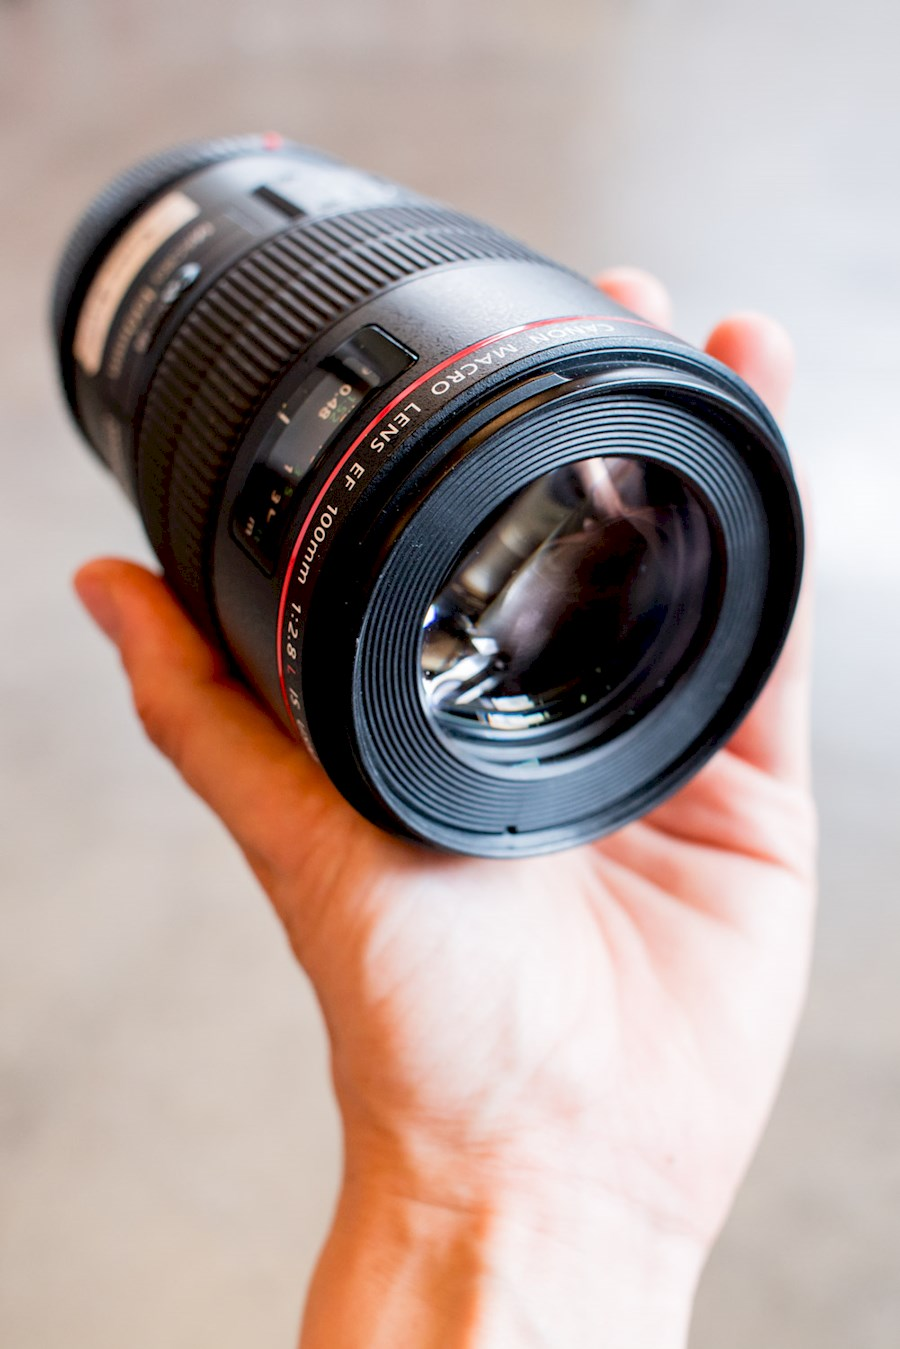 Rent a Canon 100mm f2.8 MACRO in Amsterdam from RISKE DE VRIES